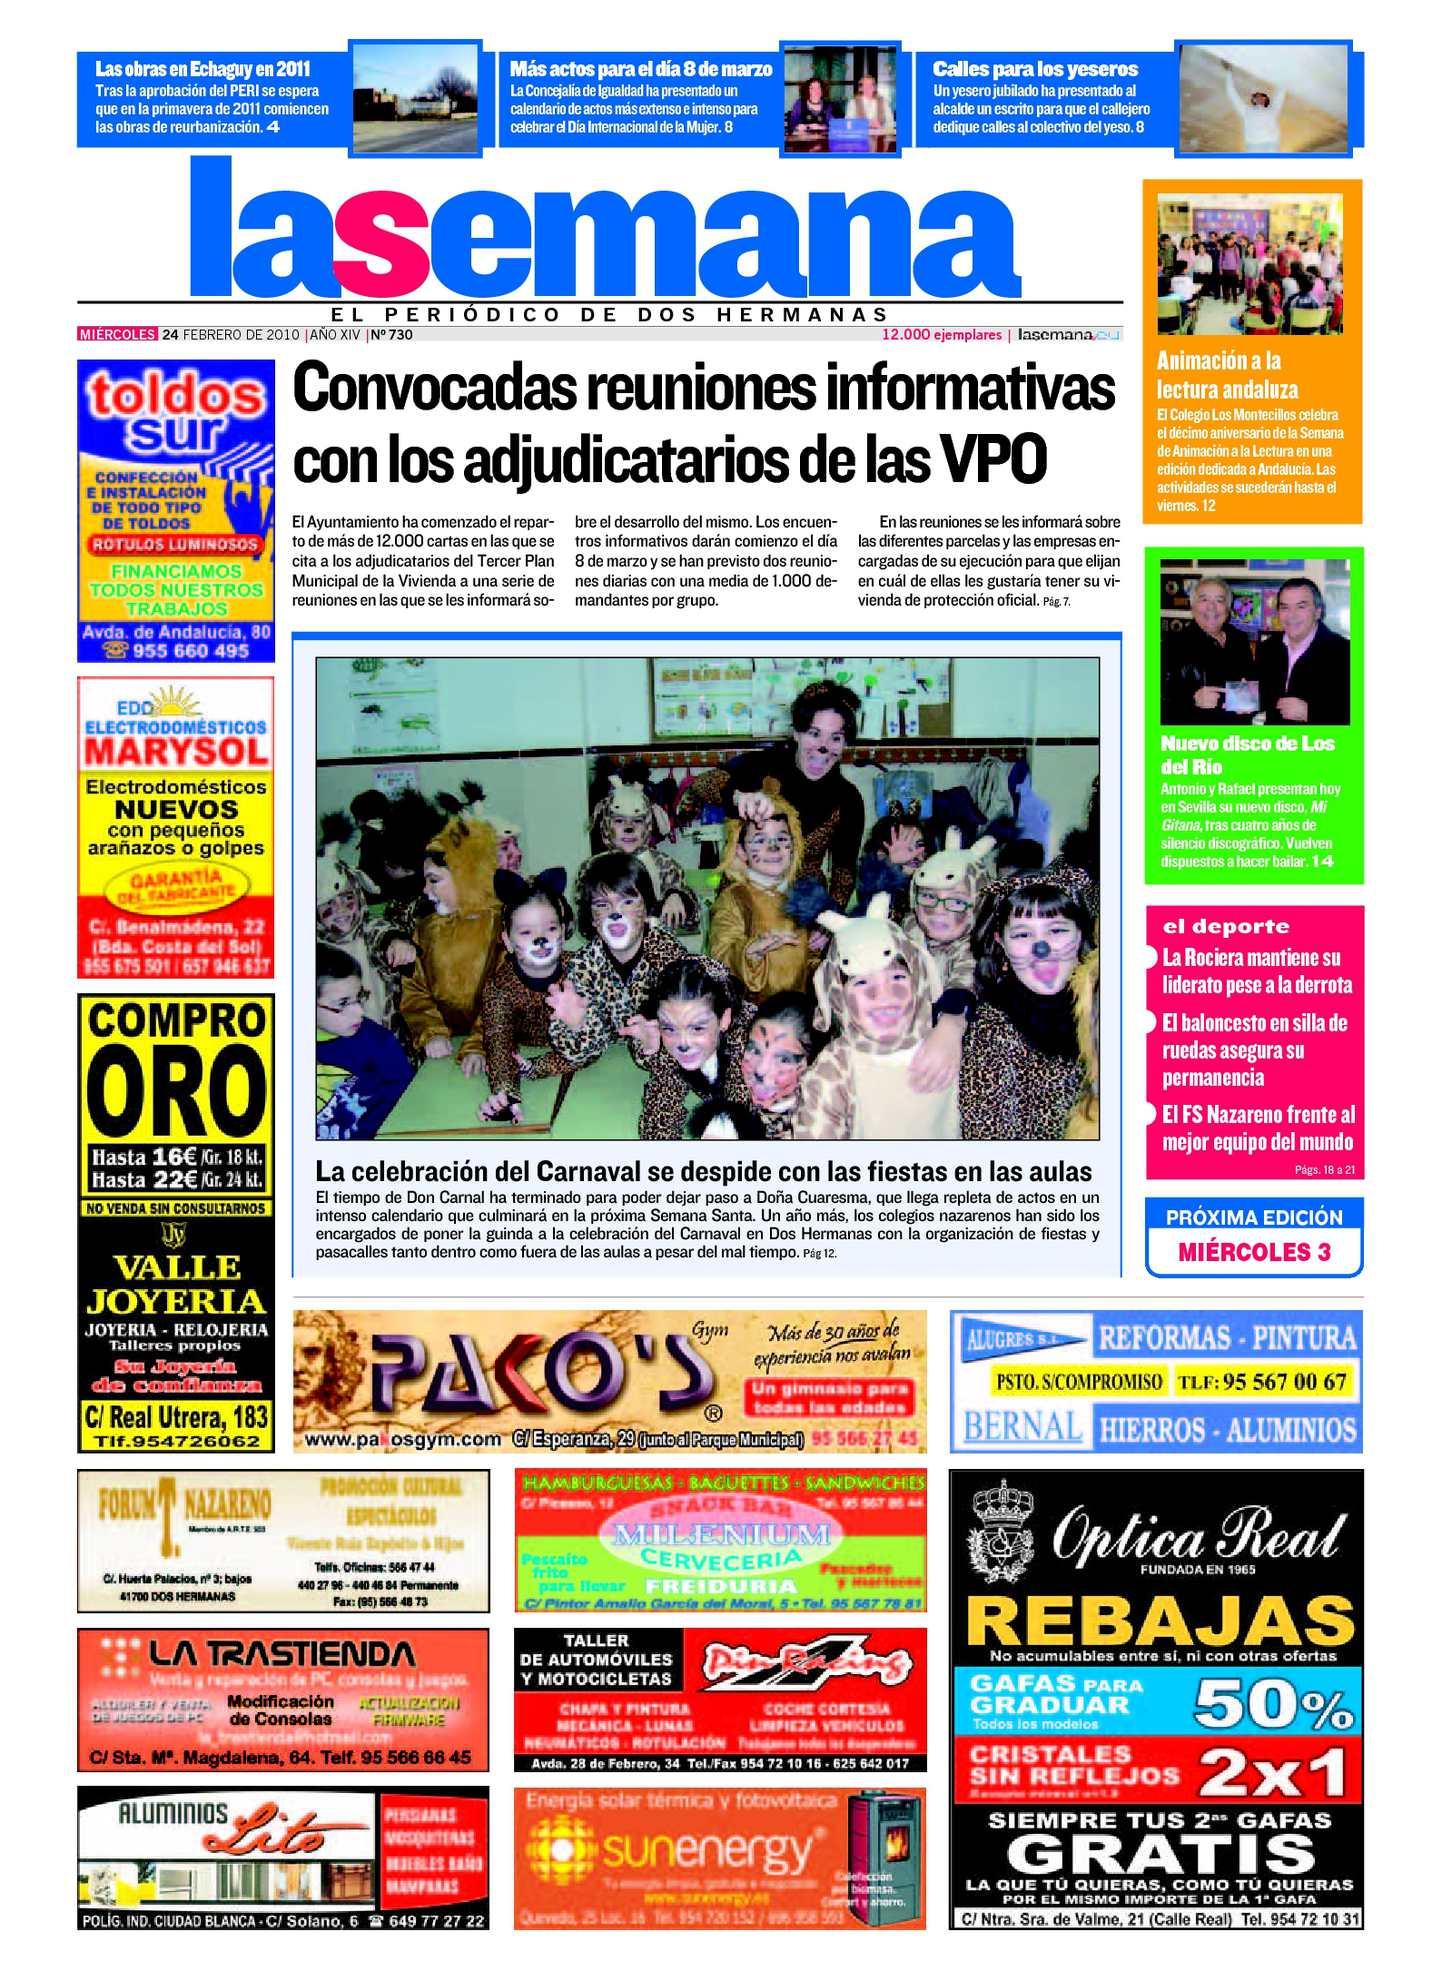 Calaméo - Periódico La Semana de Dos Hermanas Nº 730. 24 2 2010 a1f92be40a631